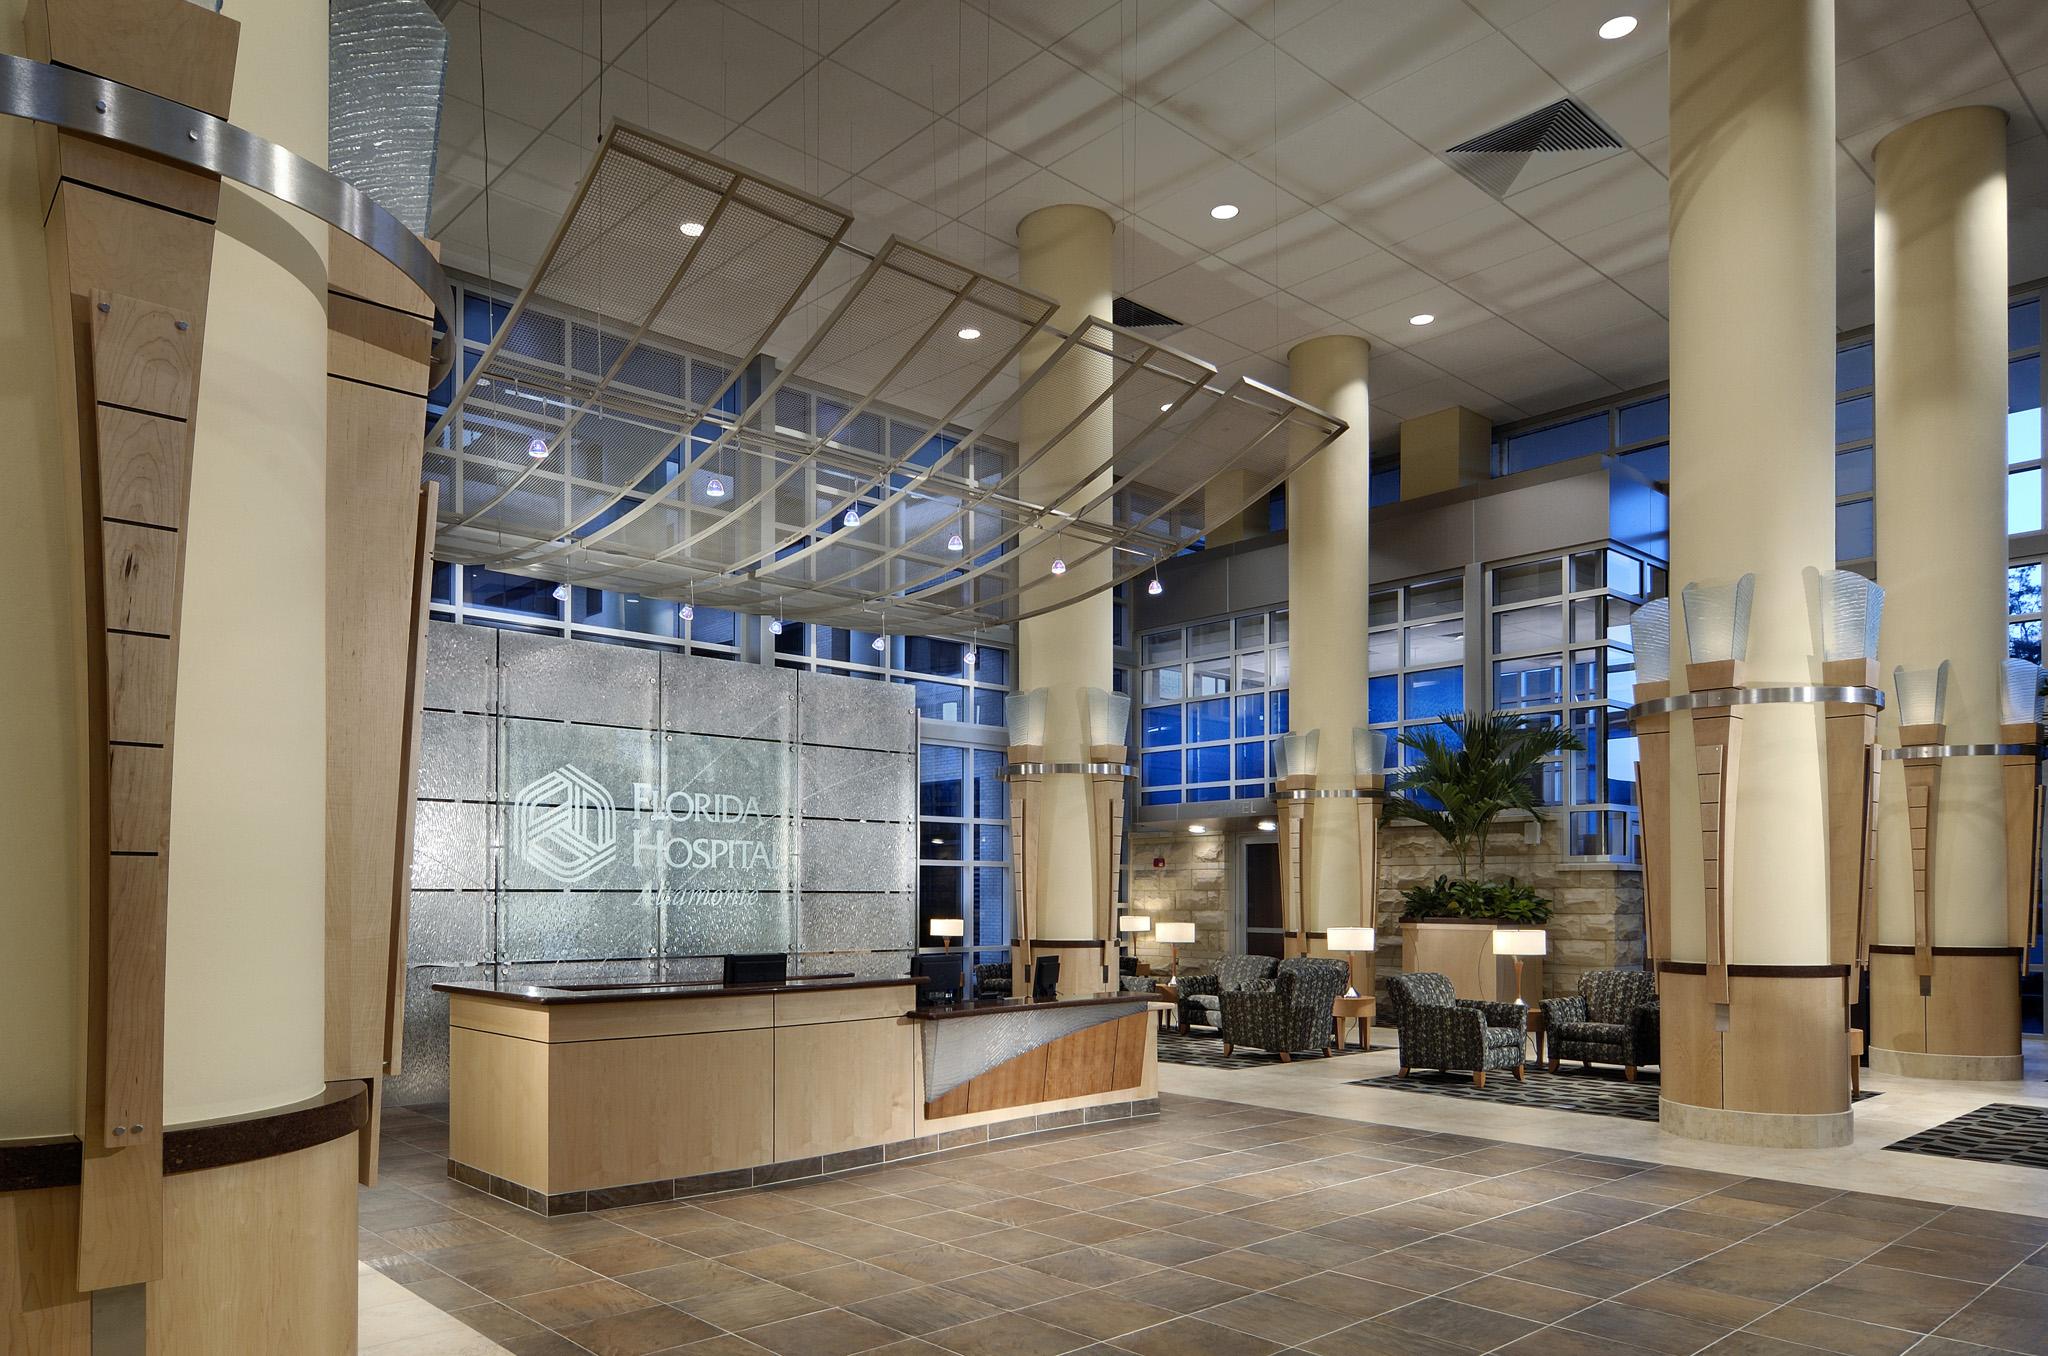 Florida Hospital Altamonte Glass Reception Area